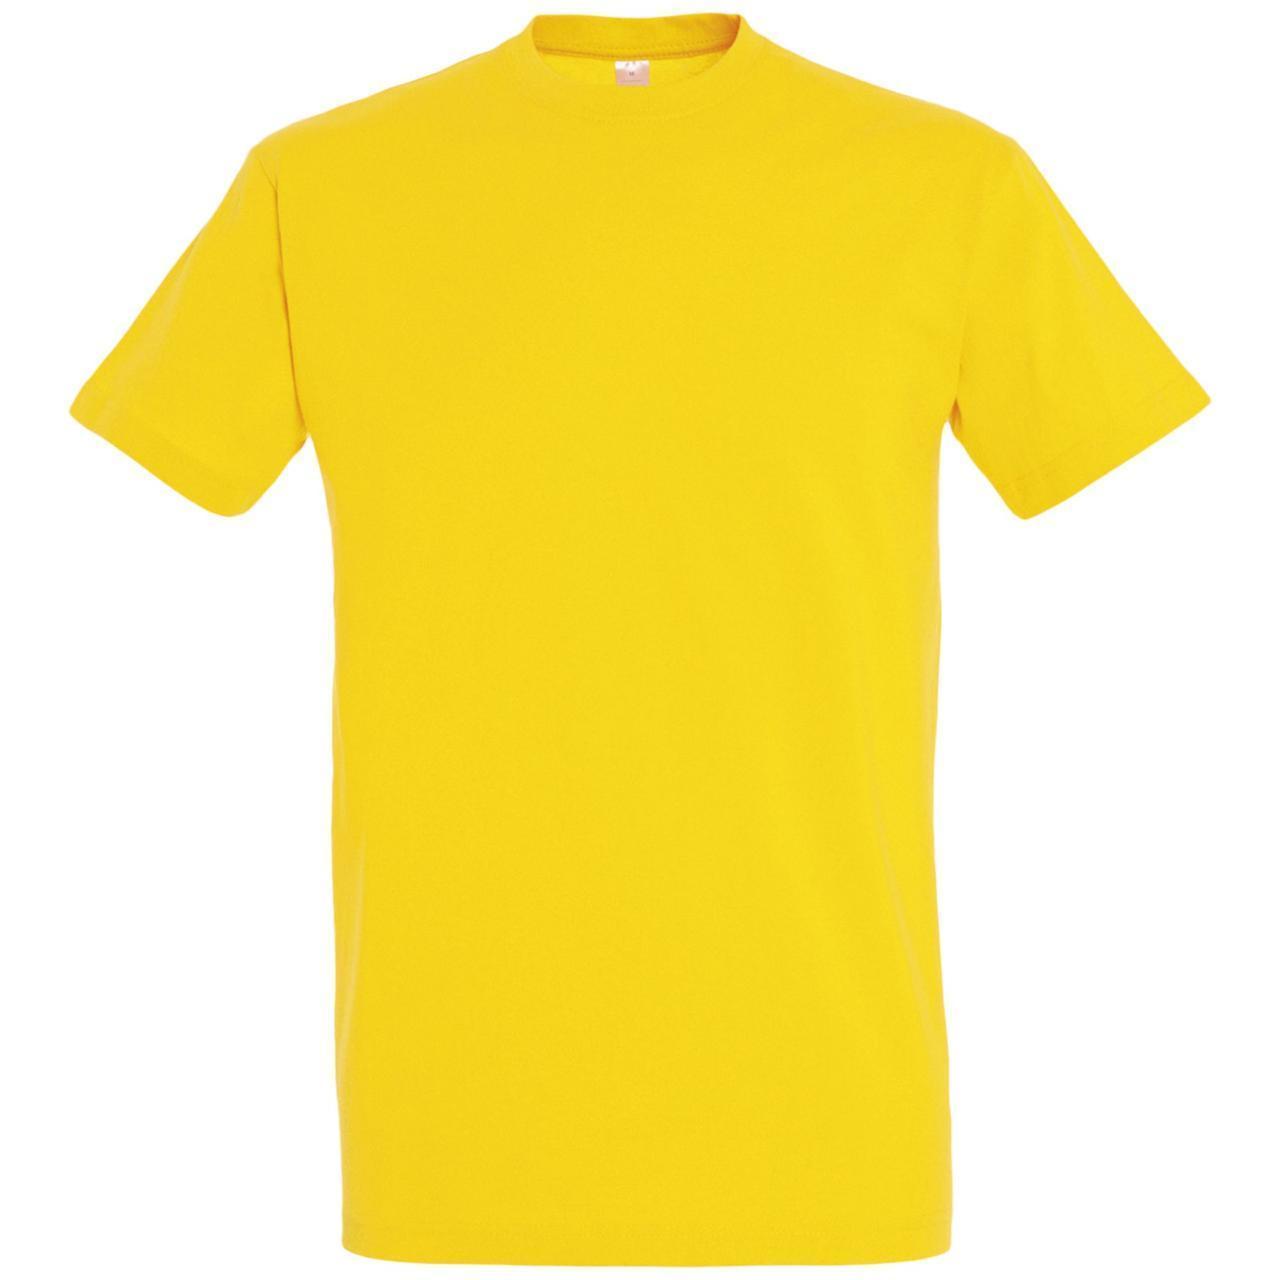 Oднотонная футболка | Желтая | 160 гр. | M